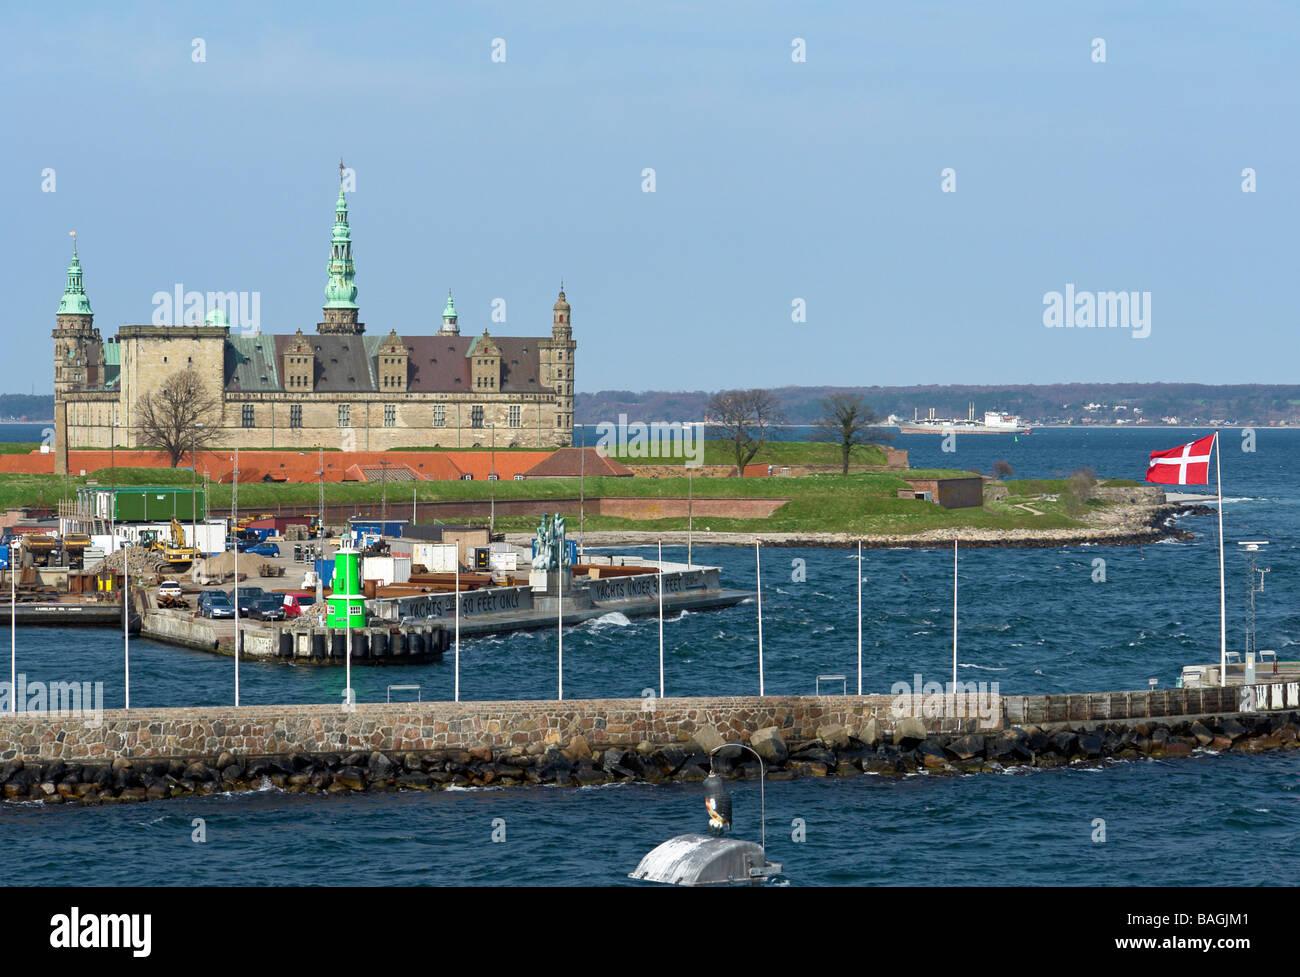 Danish castle Kronborg guarding the Oeresund passage between Helsingor Denmark and Helsingborg in Sweden - Stock Image